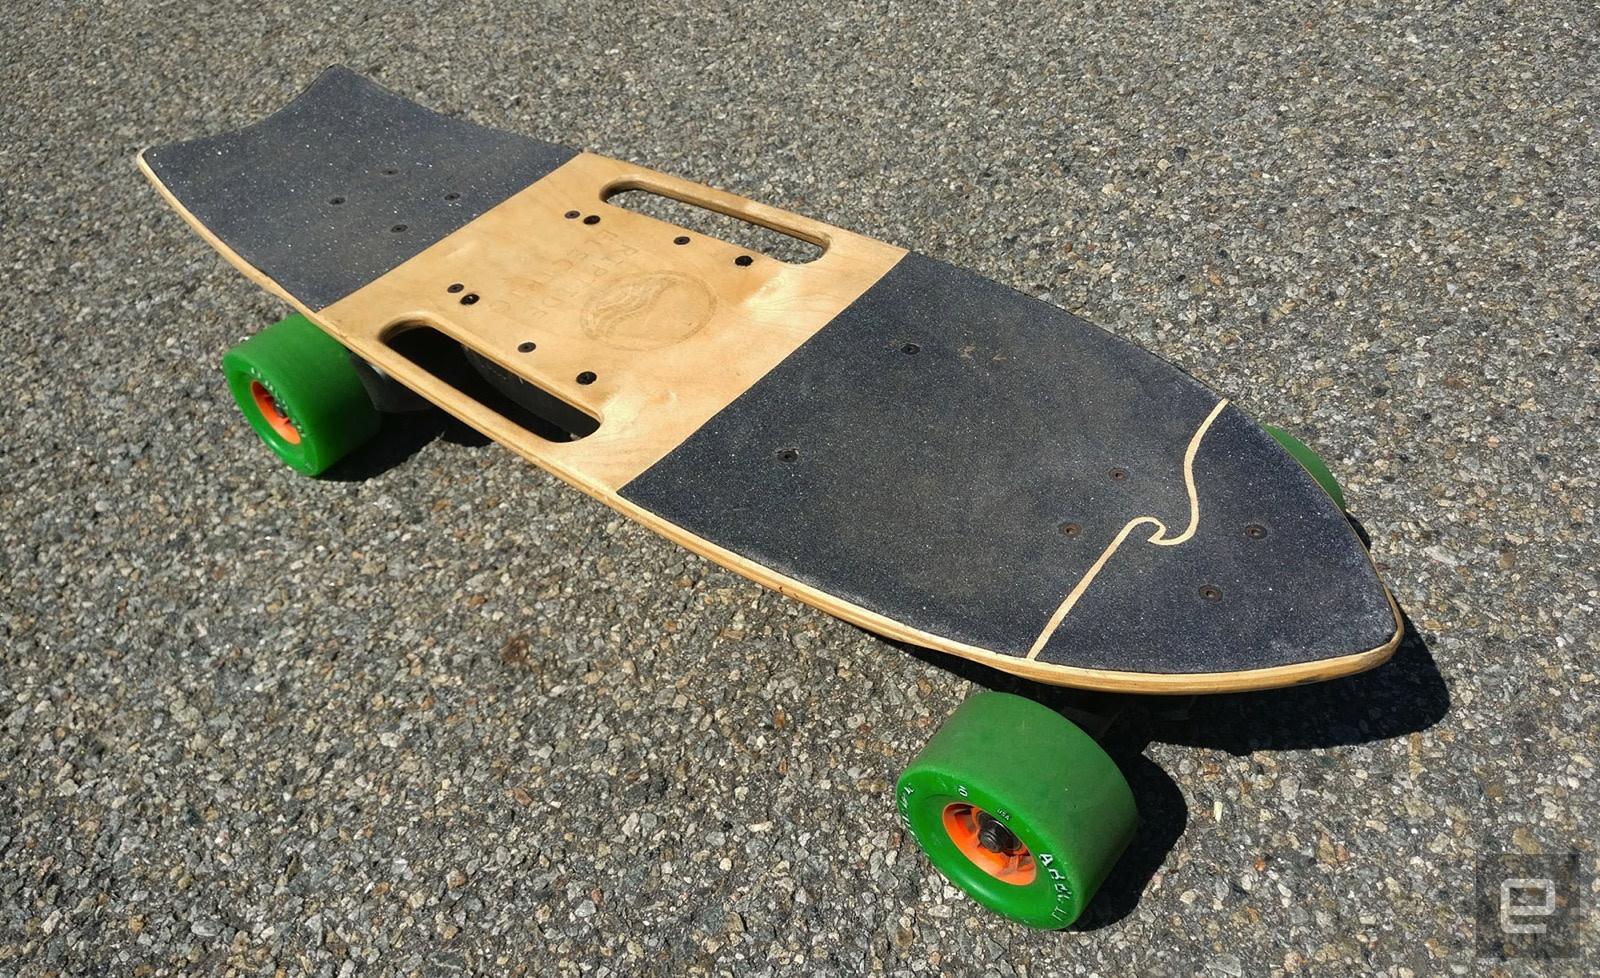 Riptide S Electric Skateboard Balances Power And Portability